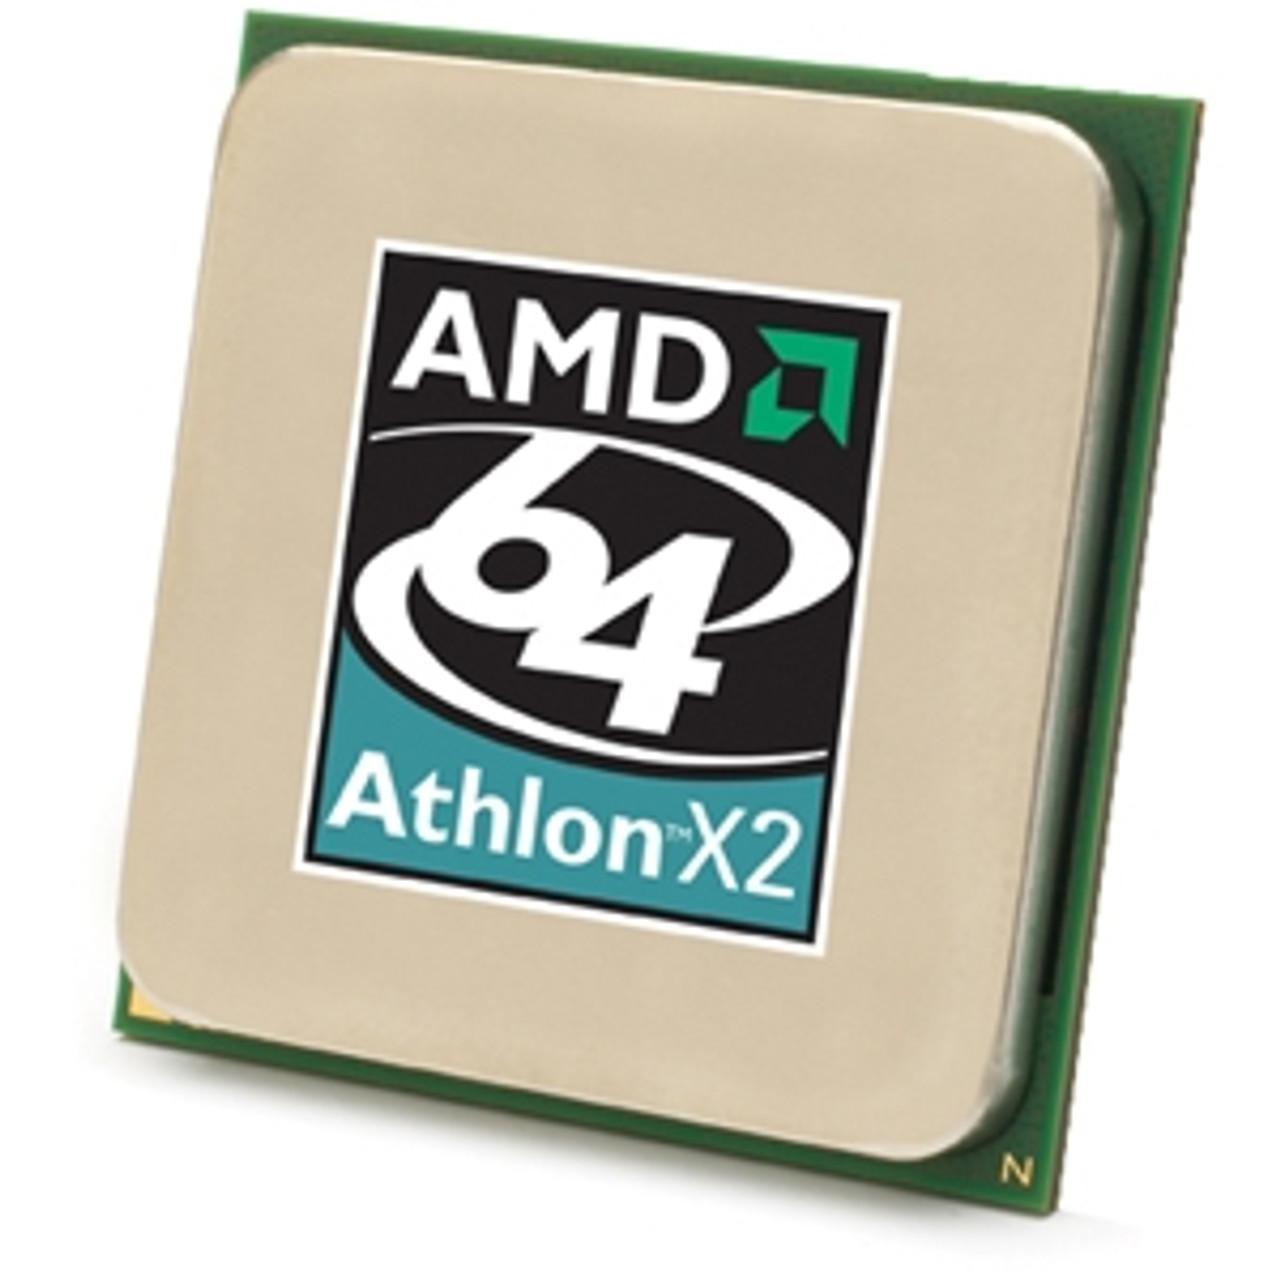 Add3400iaa5cu Amd Athlon 64 X2 3400 1 8ghz Desktop Cpu